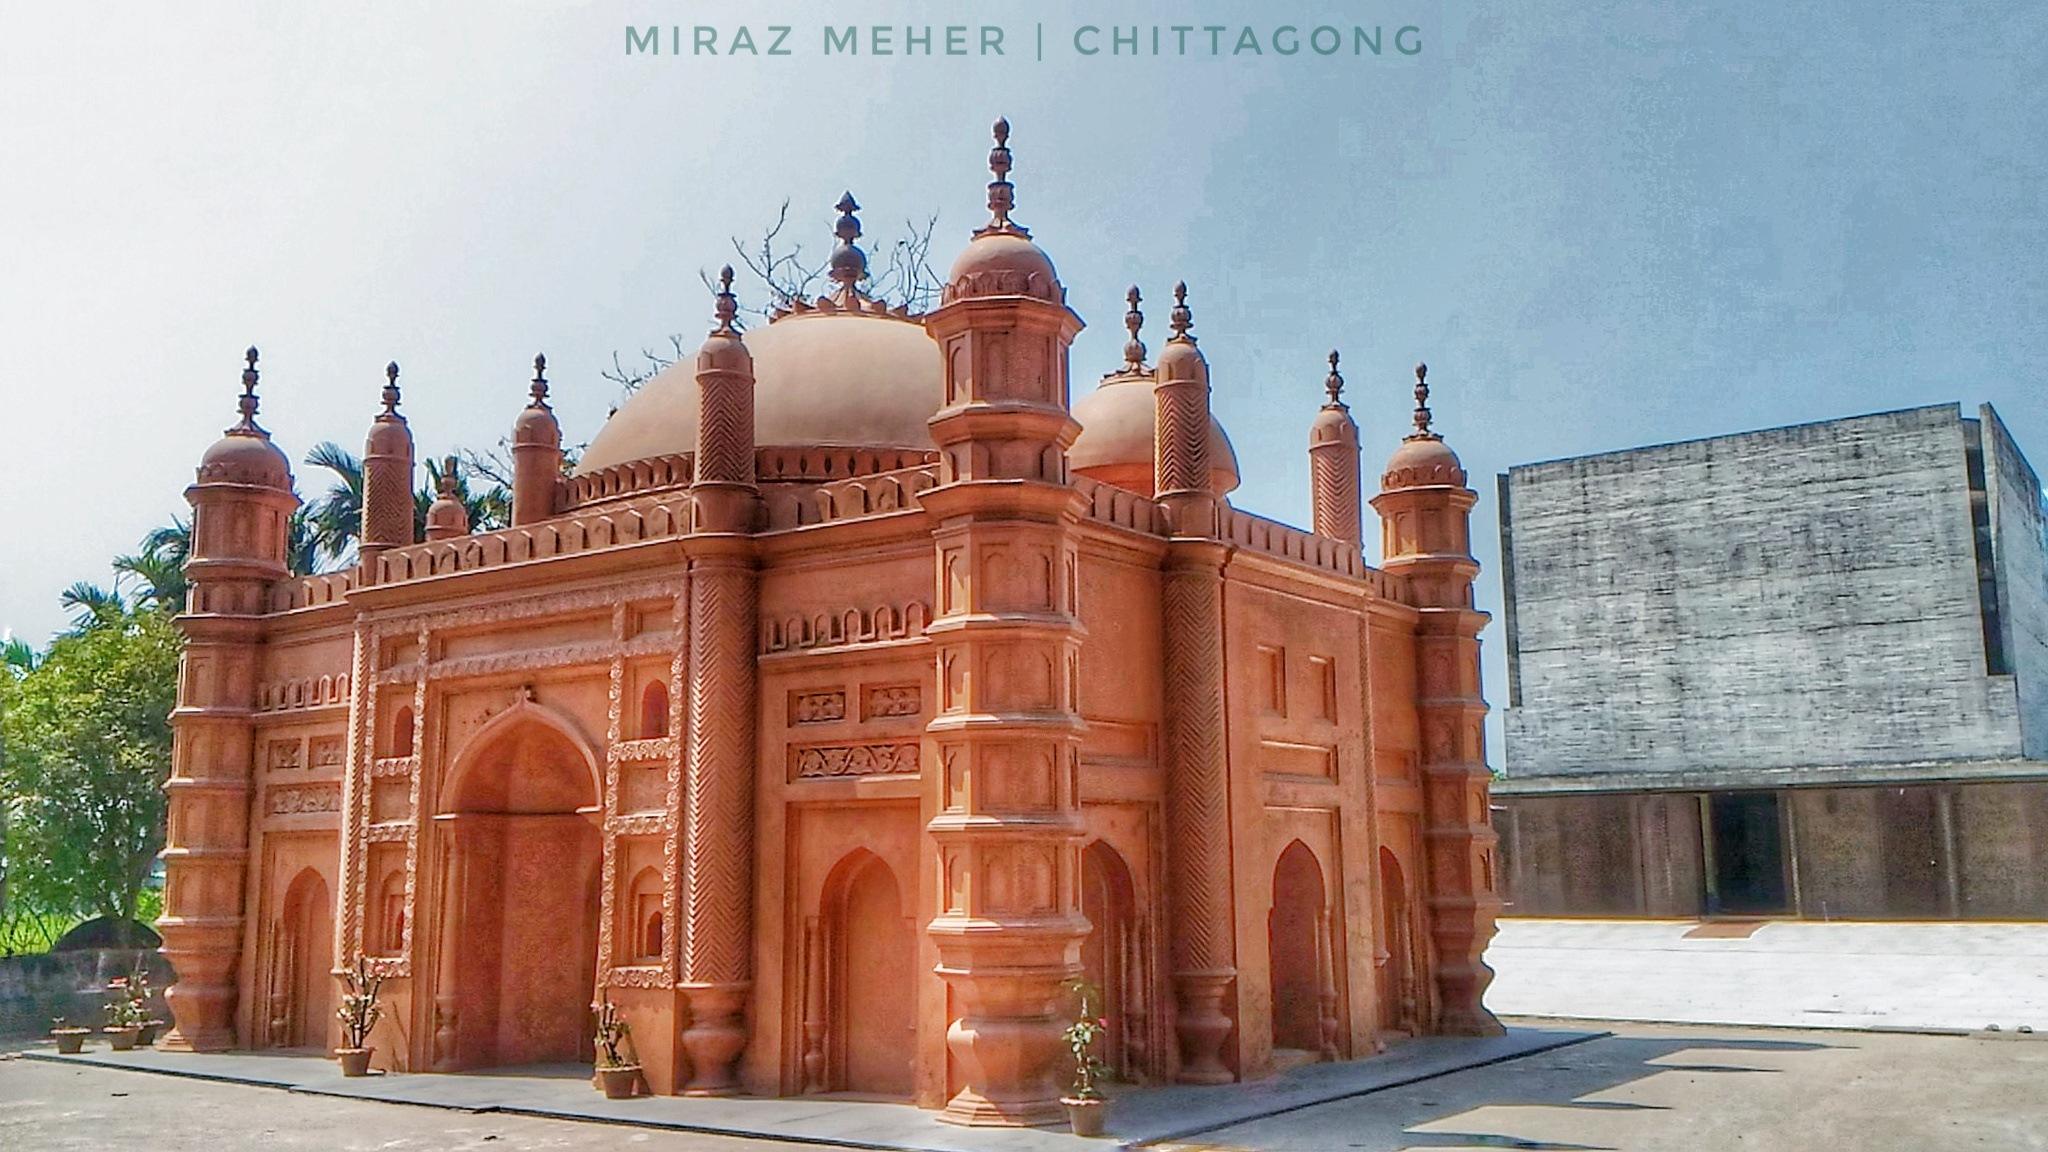 Chowdhury Mosque by Miraz Meher